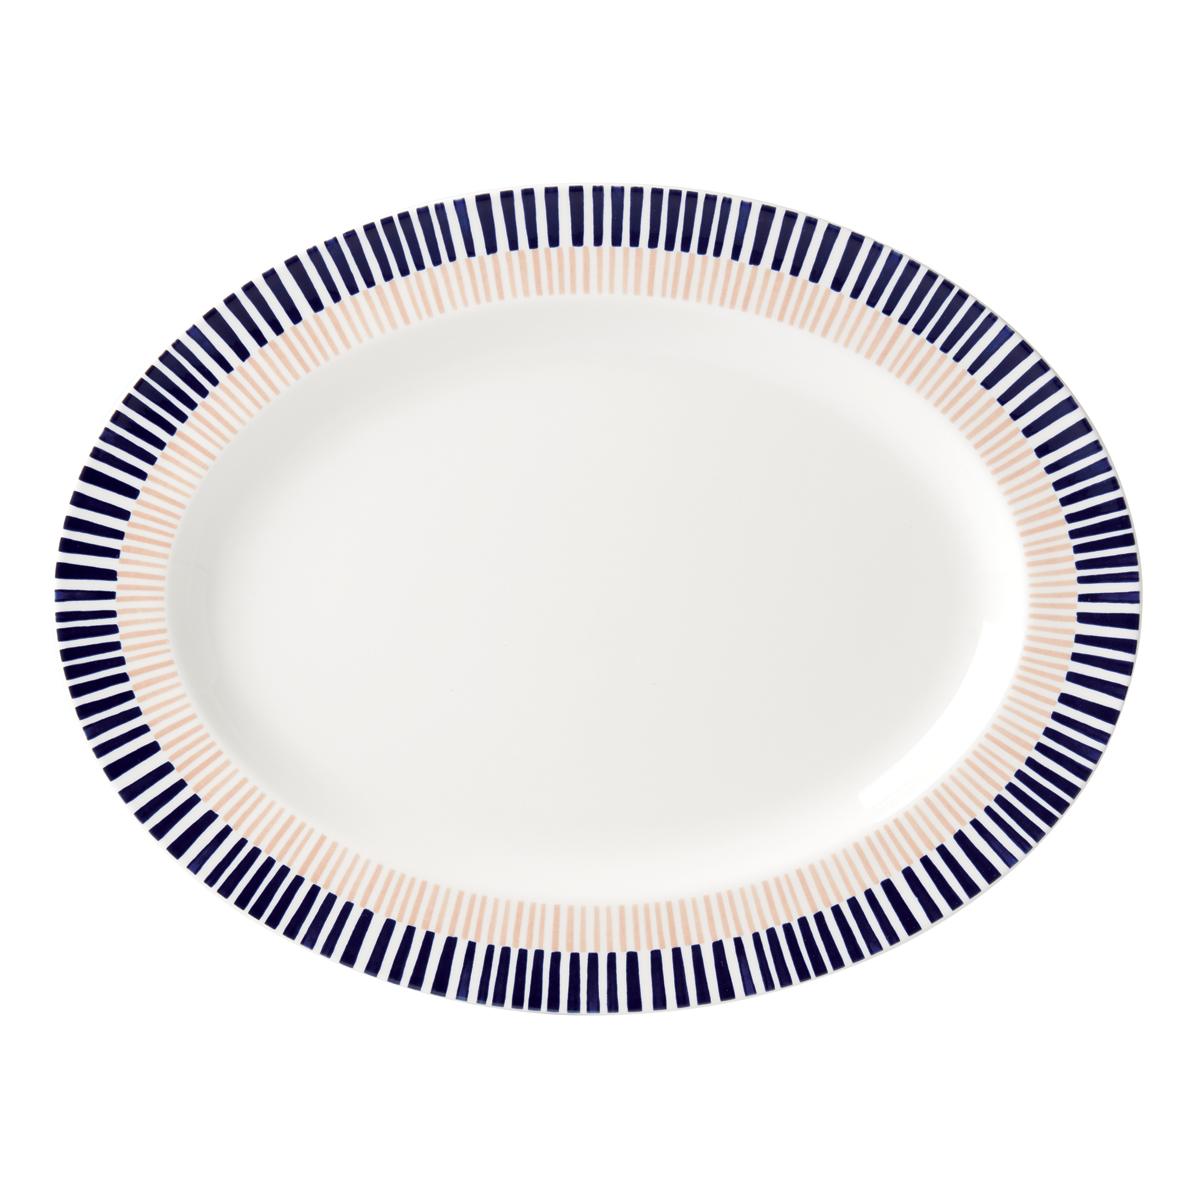 Kate Spade China by Lenox, Brook Ln Platter